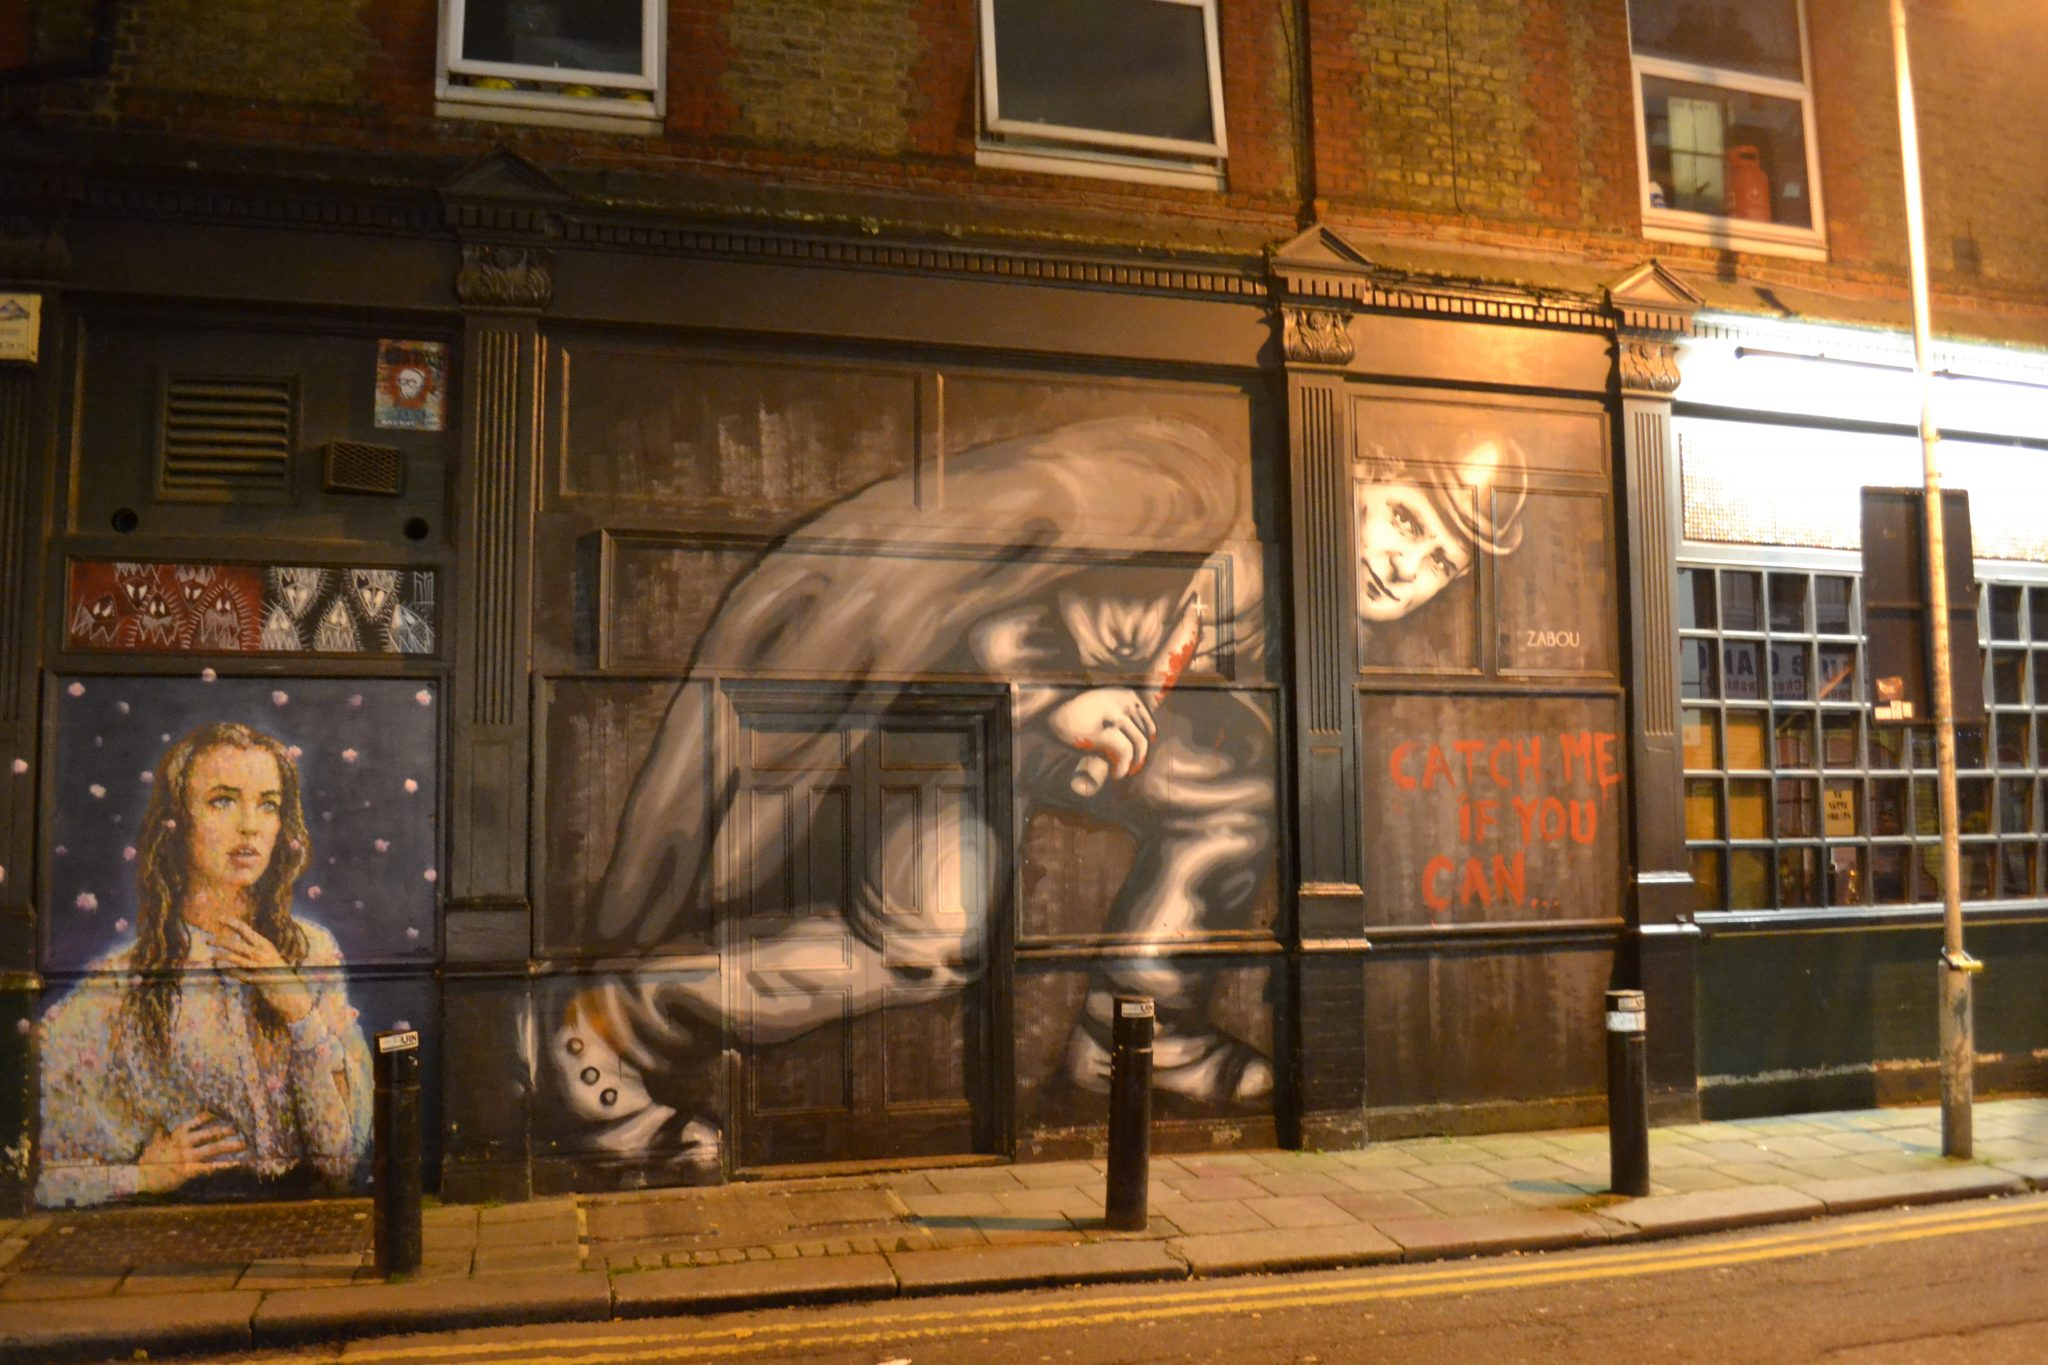 Travel Diary: London Part 4 | Jack the Ripper Tour - DSC 0349